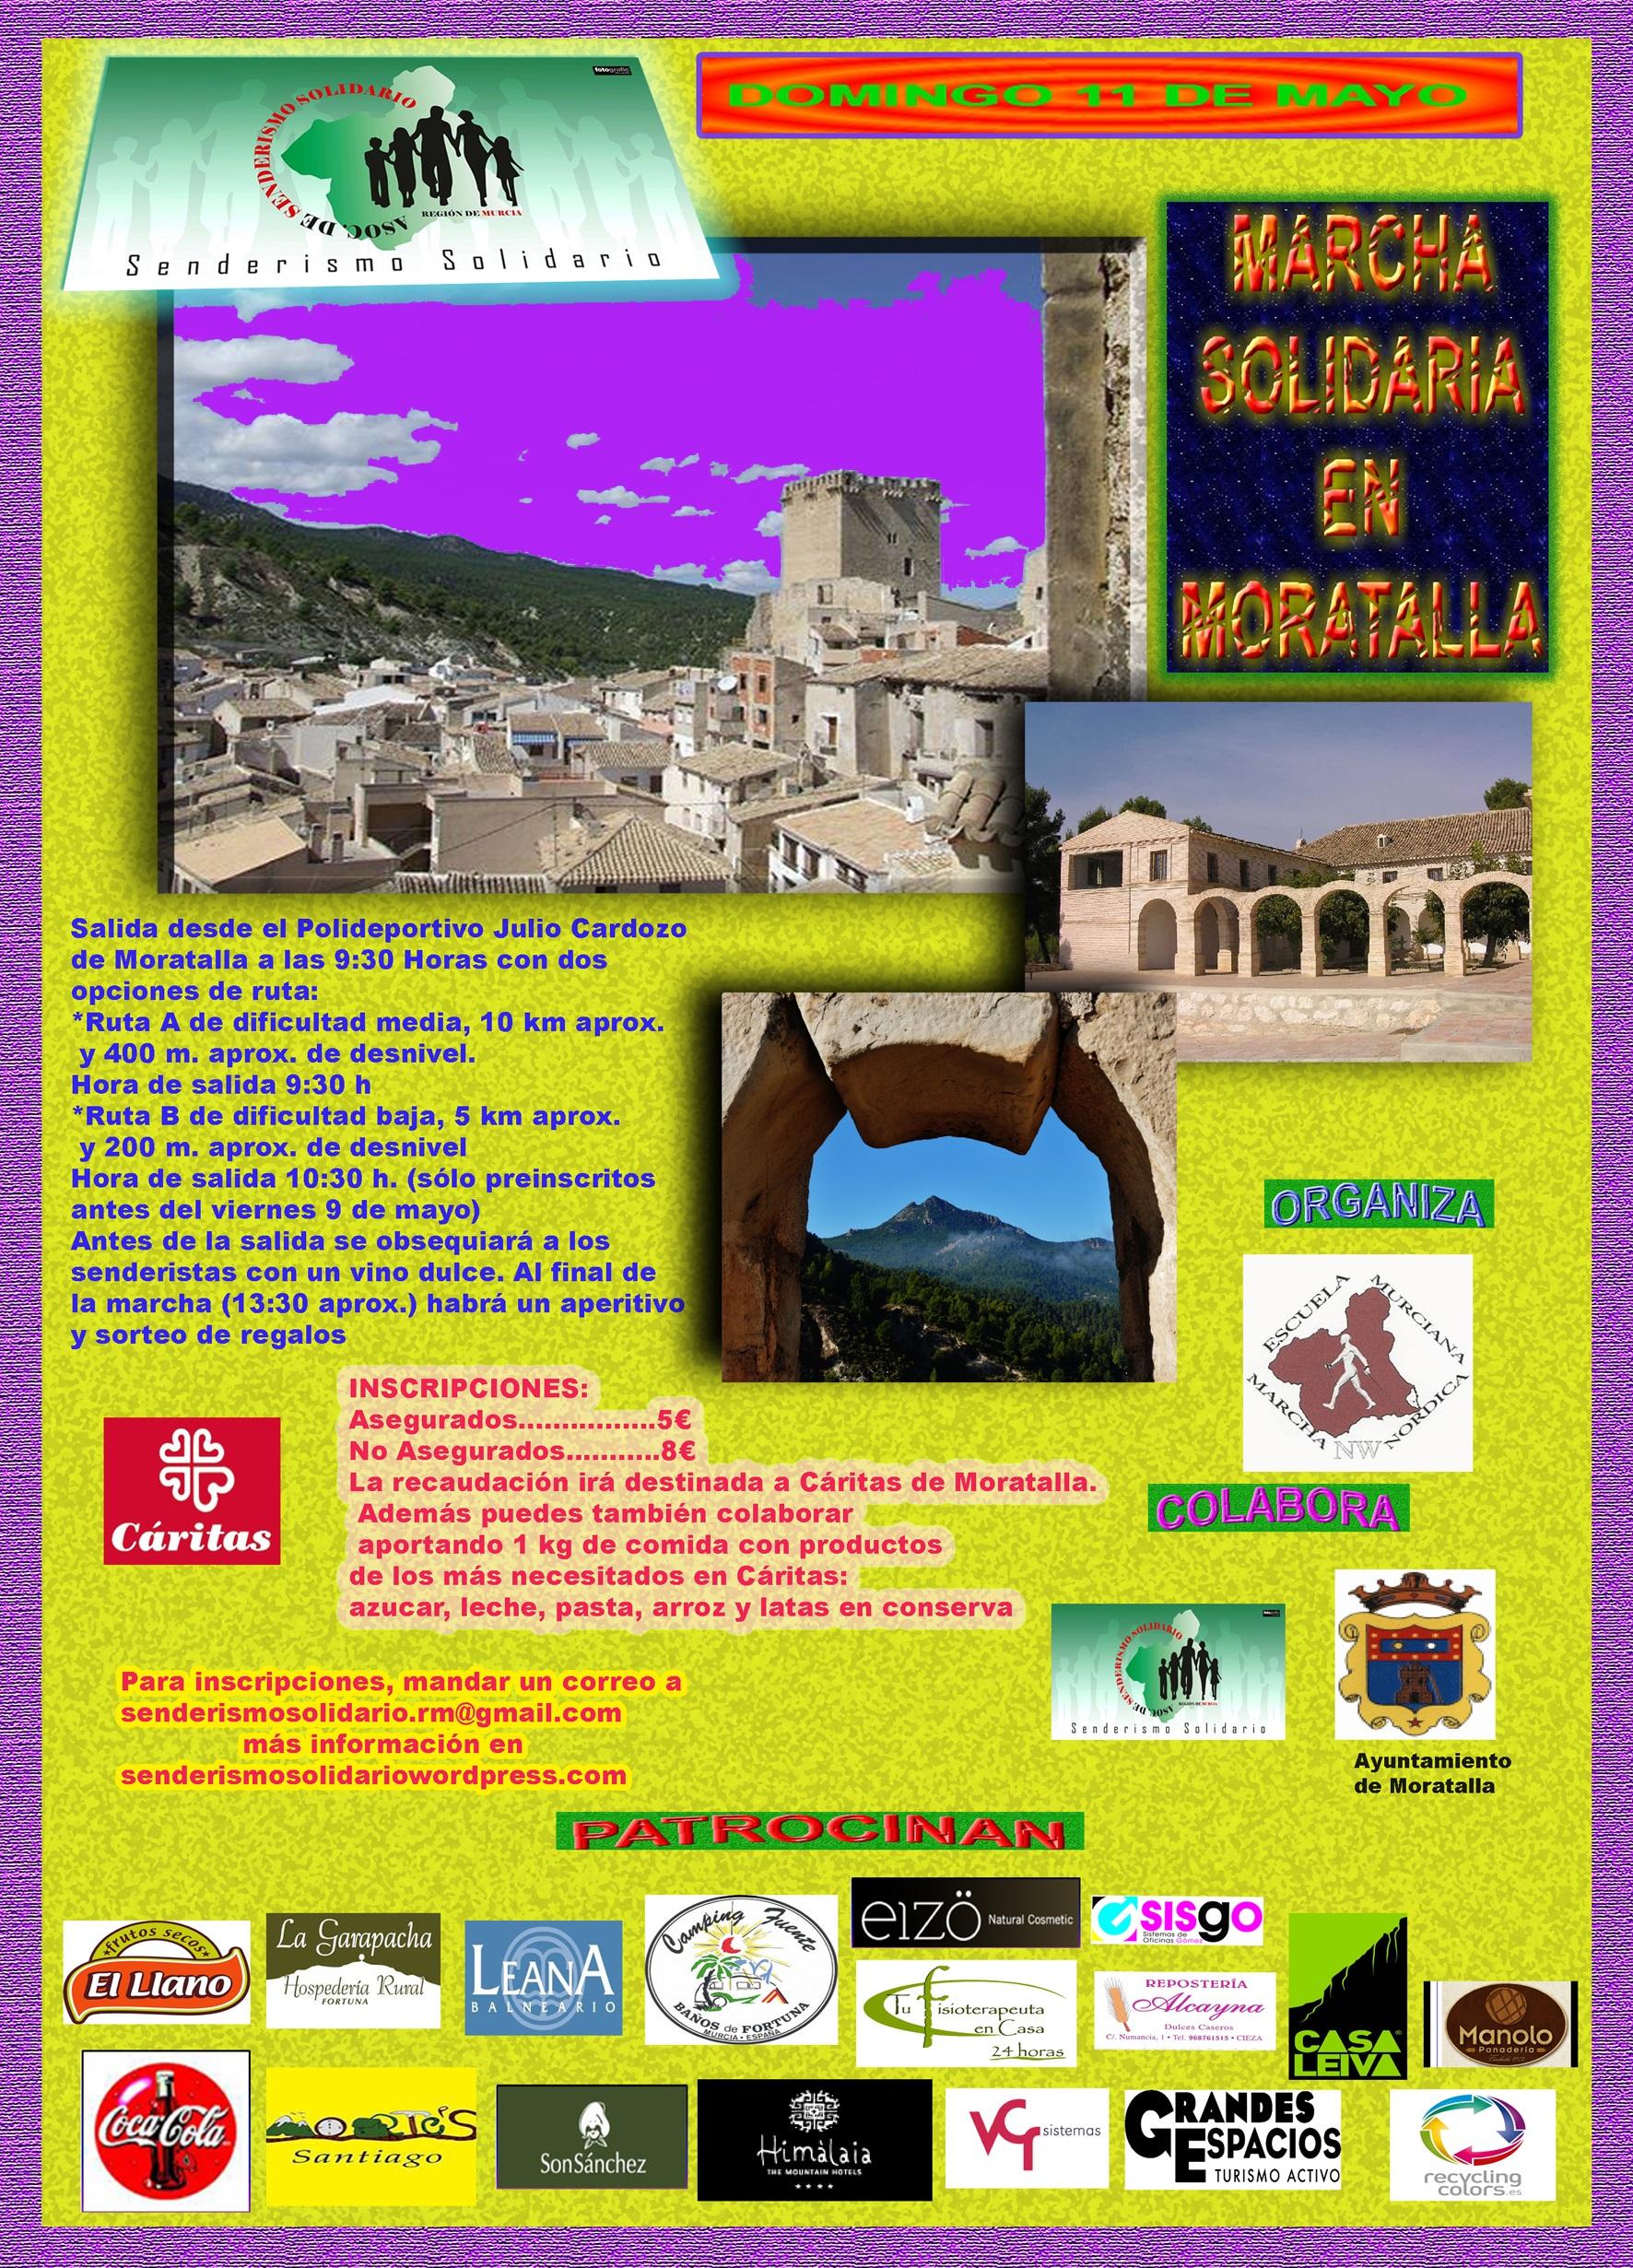 Marcha solidaria a Moratalla 11 de mayo